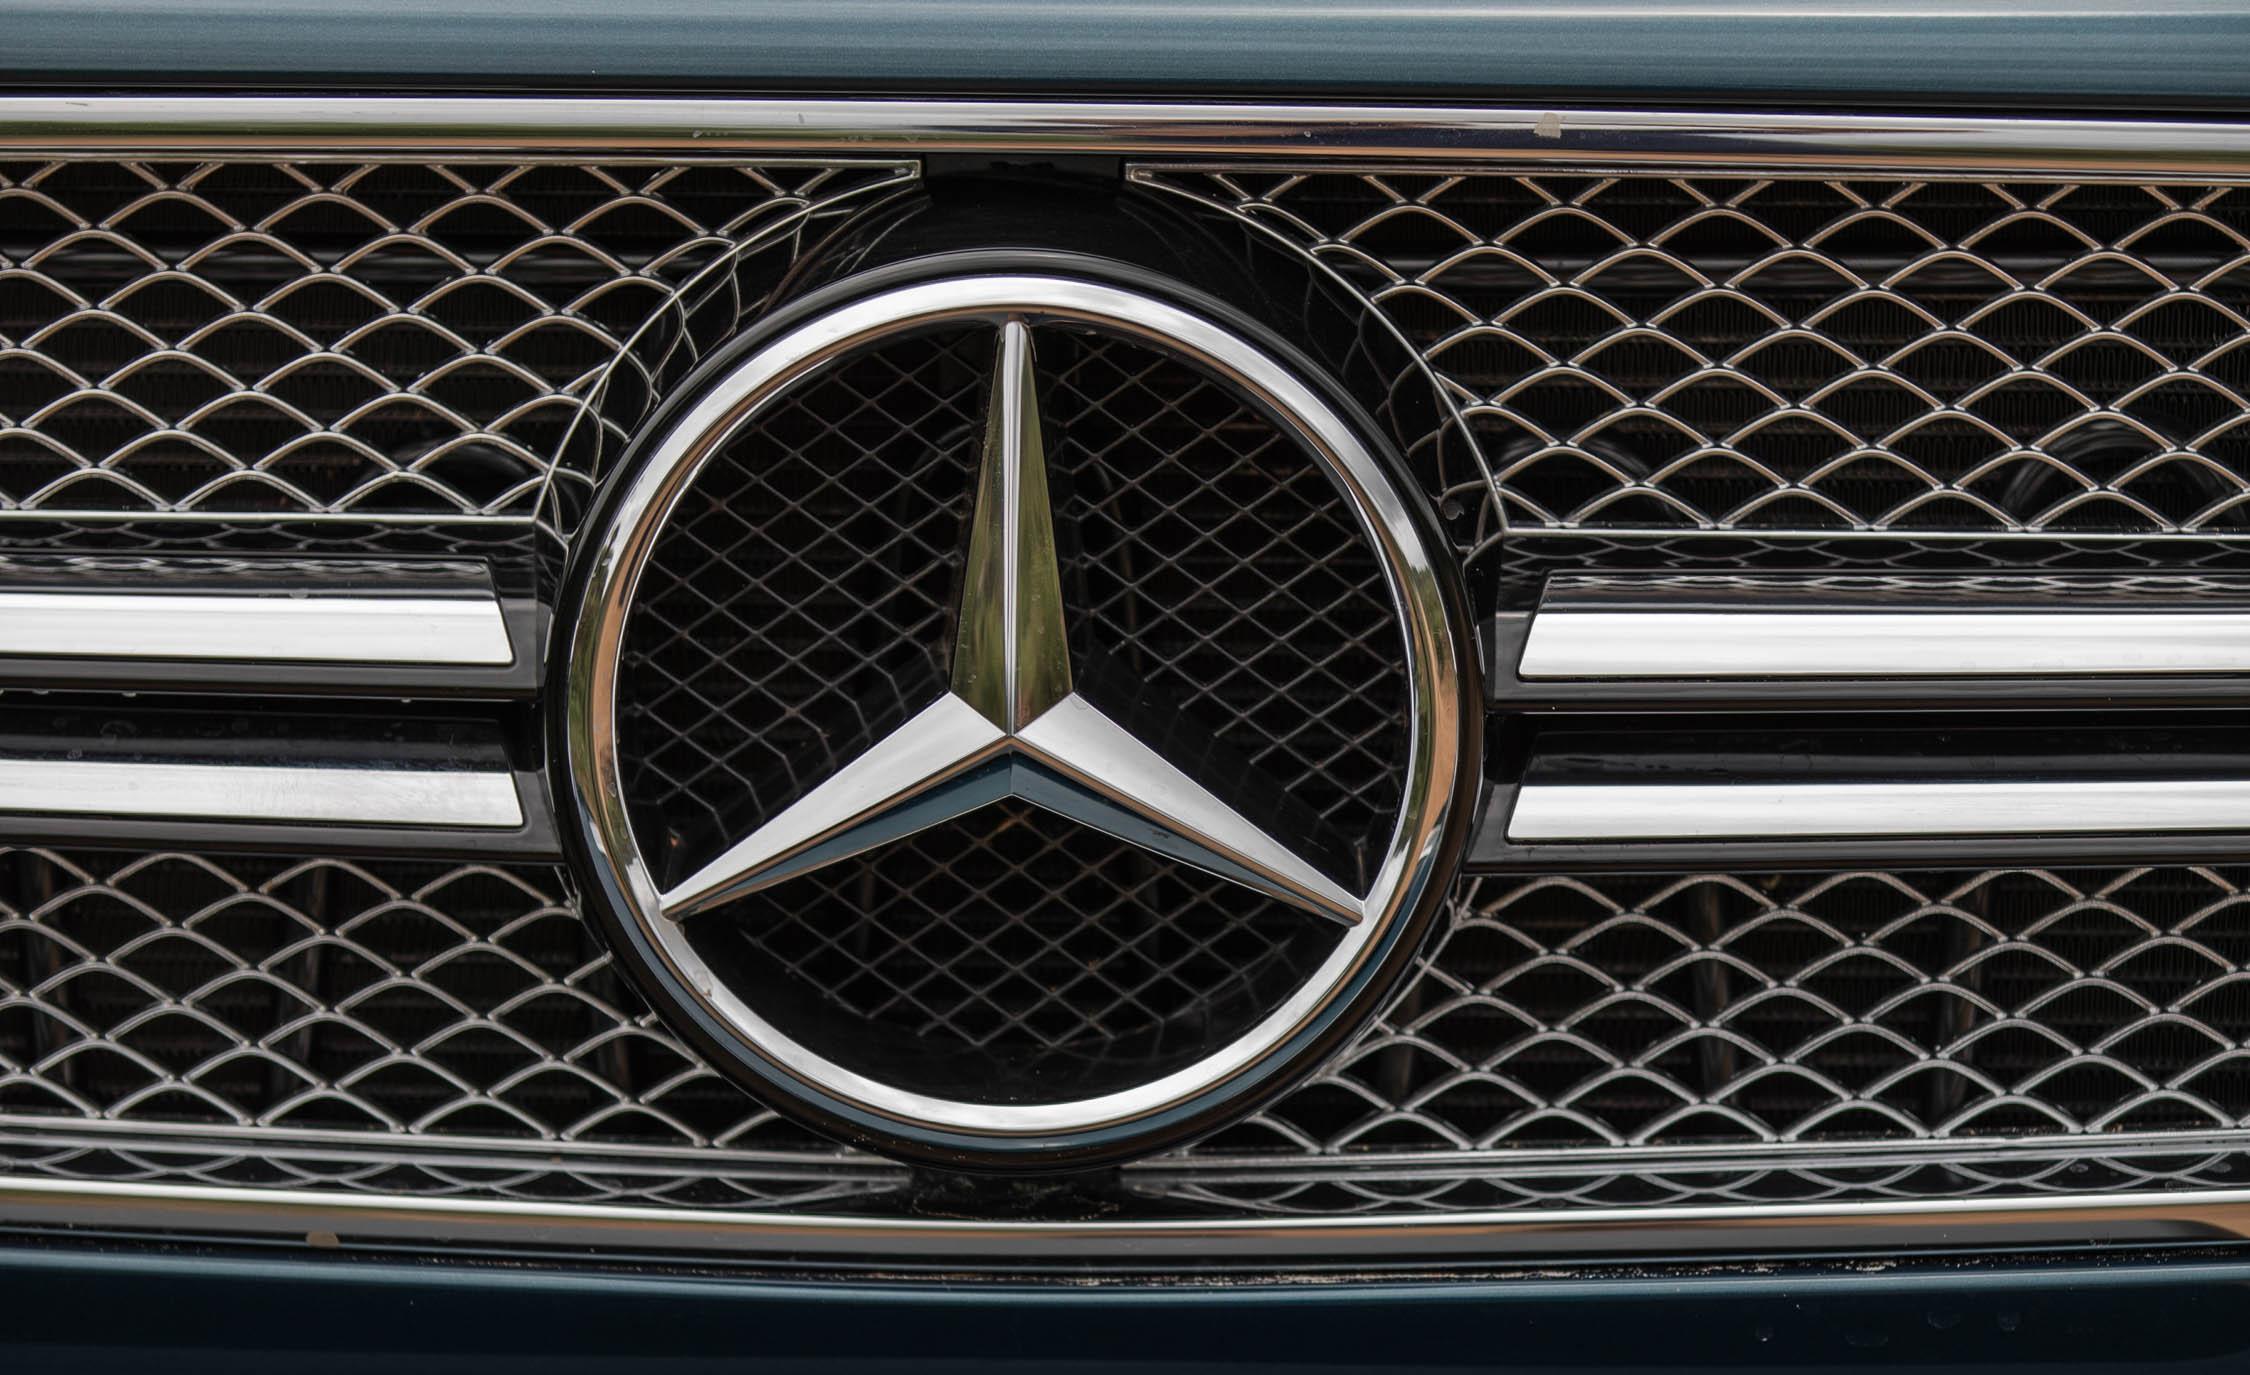 2018 Mercedes Maybach G650 Landaulet Exterior View Front Badge Emblem (Photo 47 of 52)